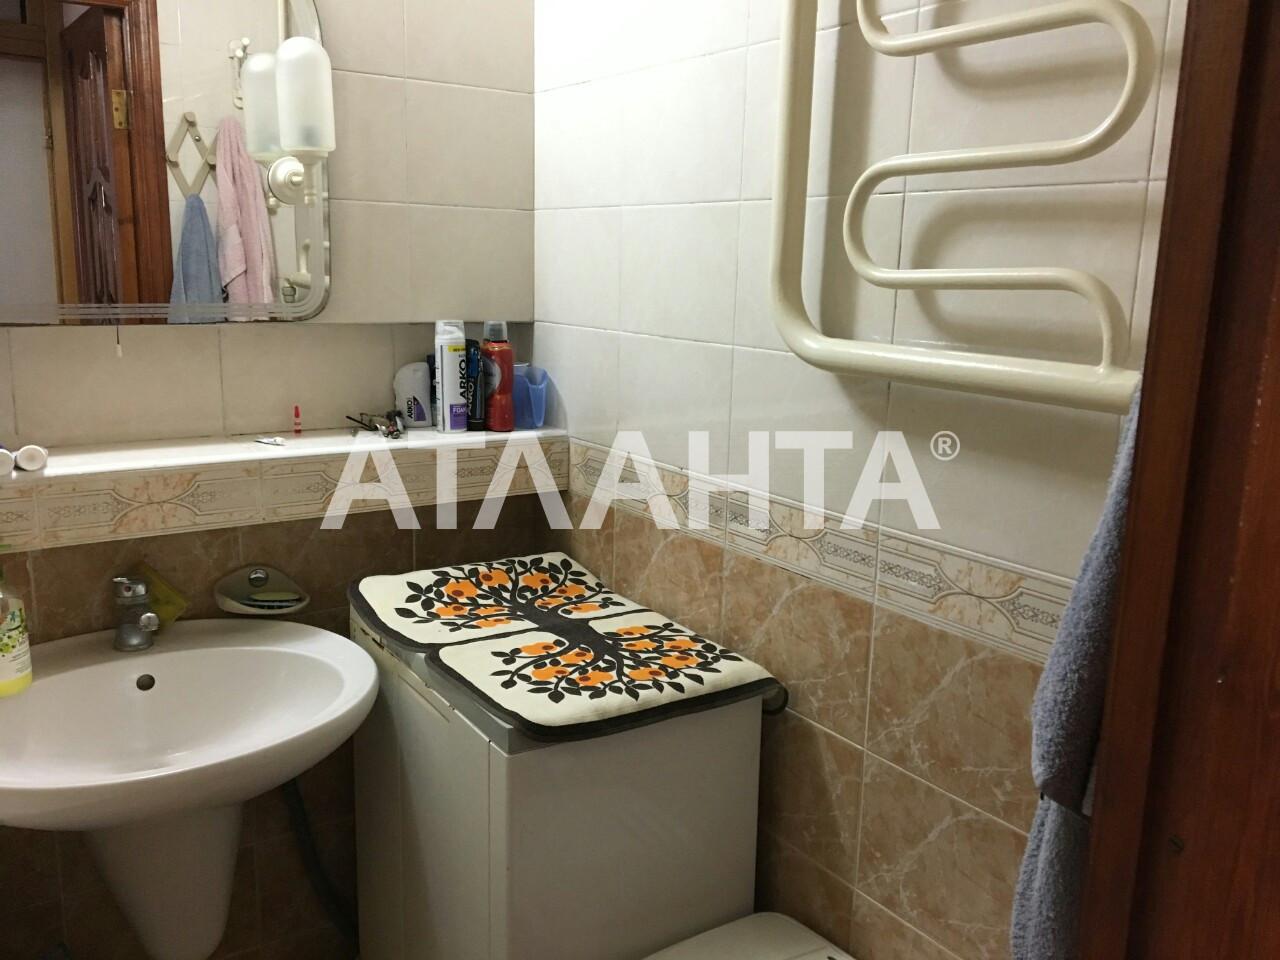 Продается 3-комнатная Квартира на ул. Архитекторская — 49 000 у.е. (фото №8)